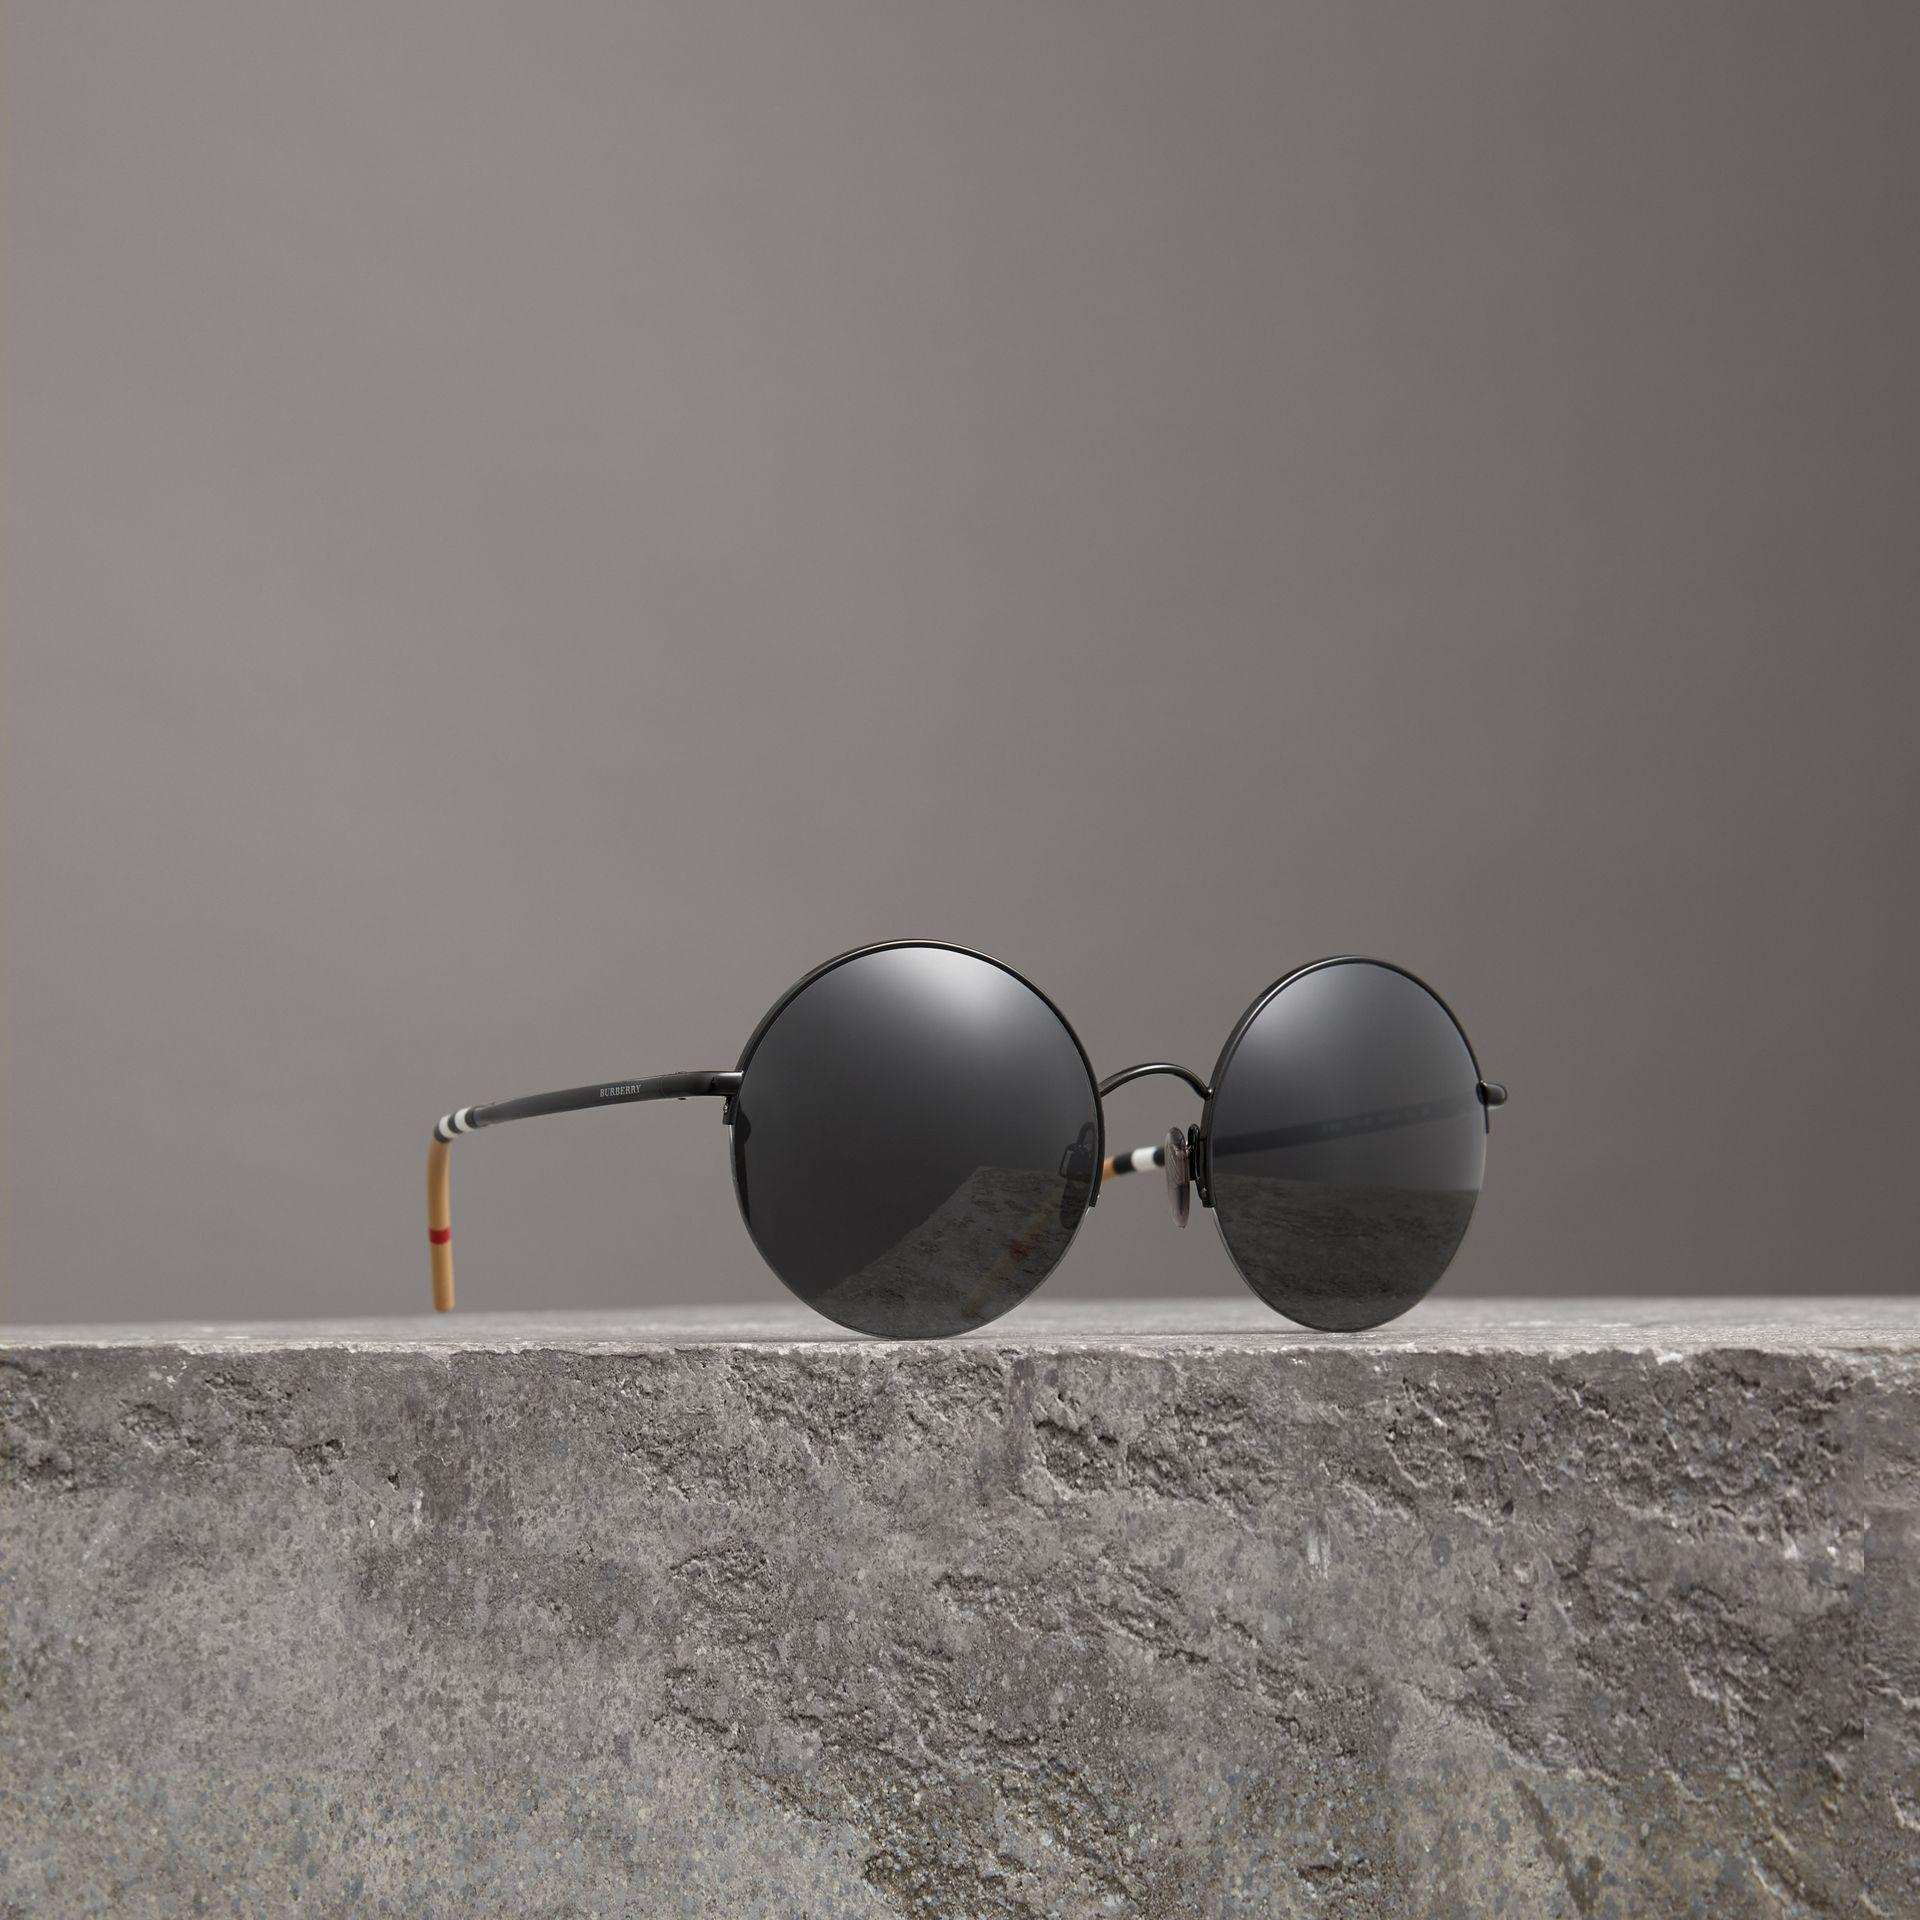 575e7e5e7bae Burberry Check Detail Round Frame Sunglasses in Black - Lyst